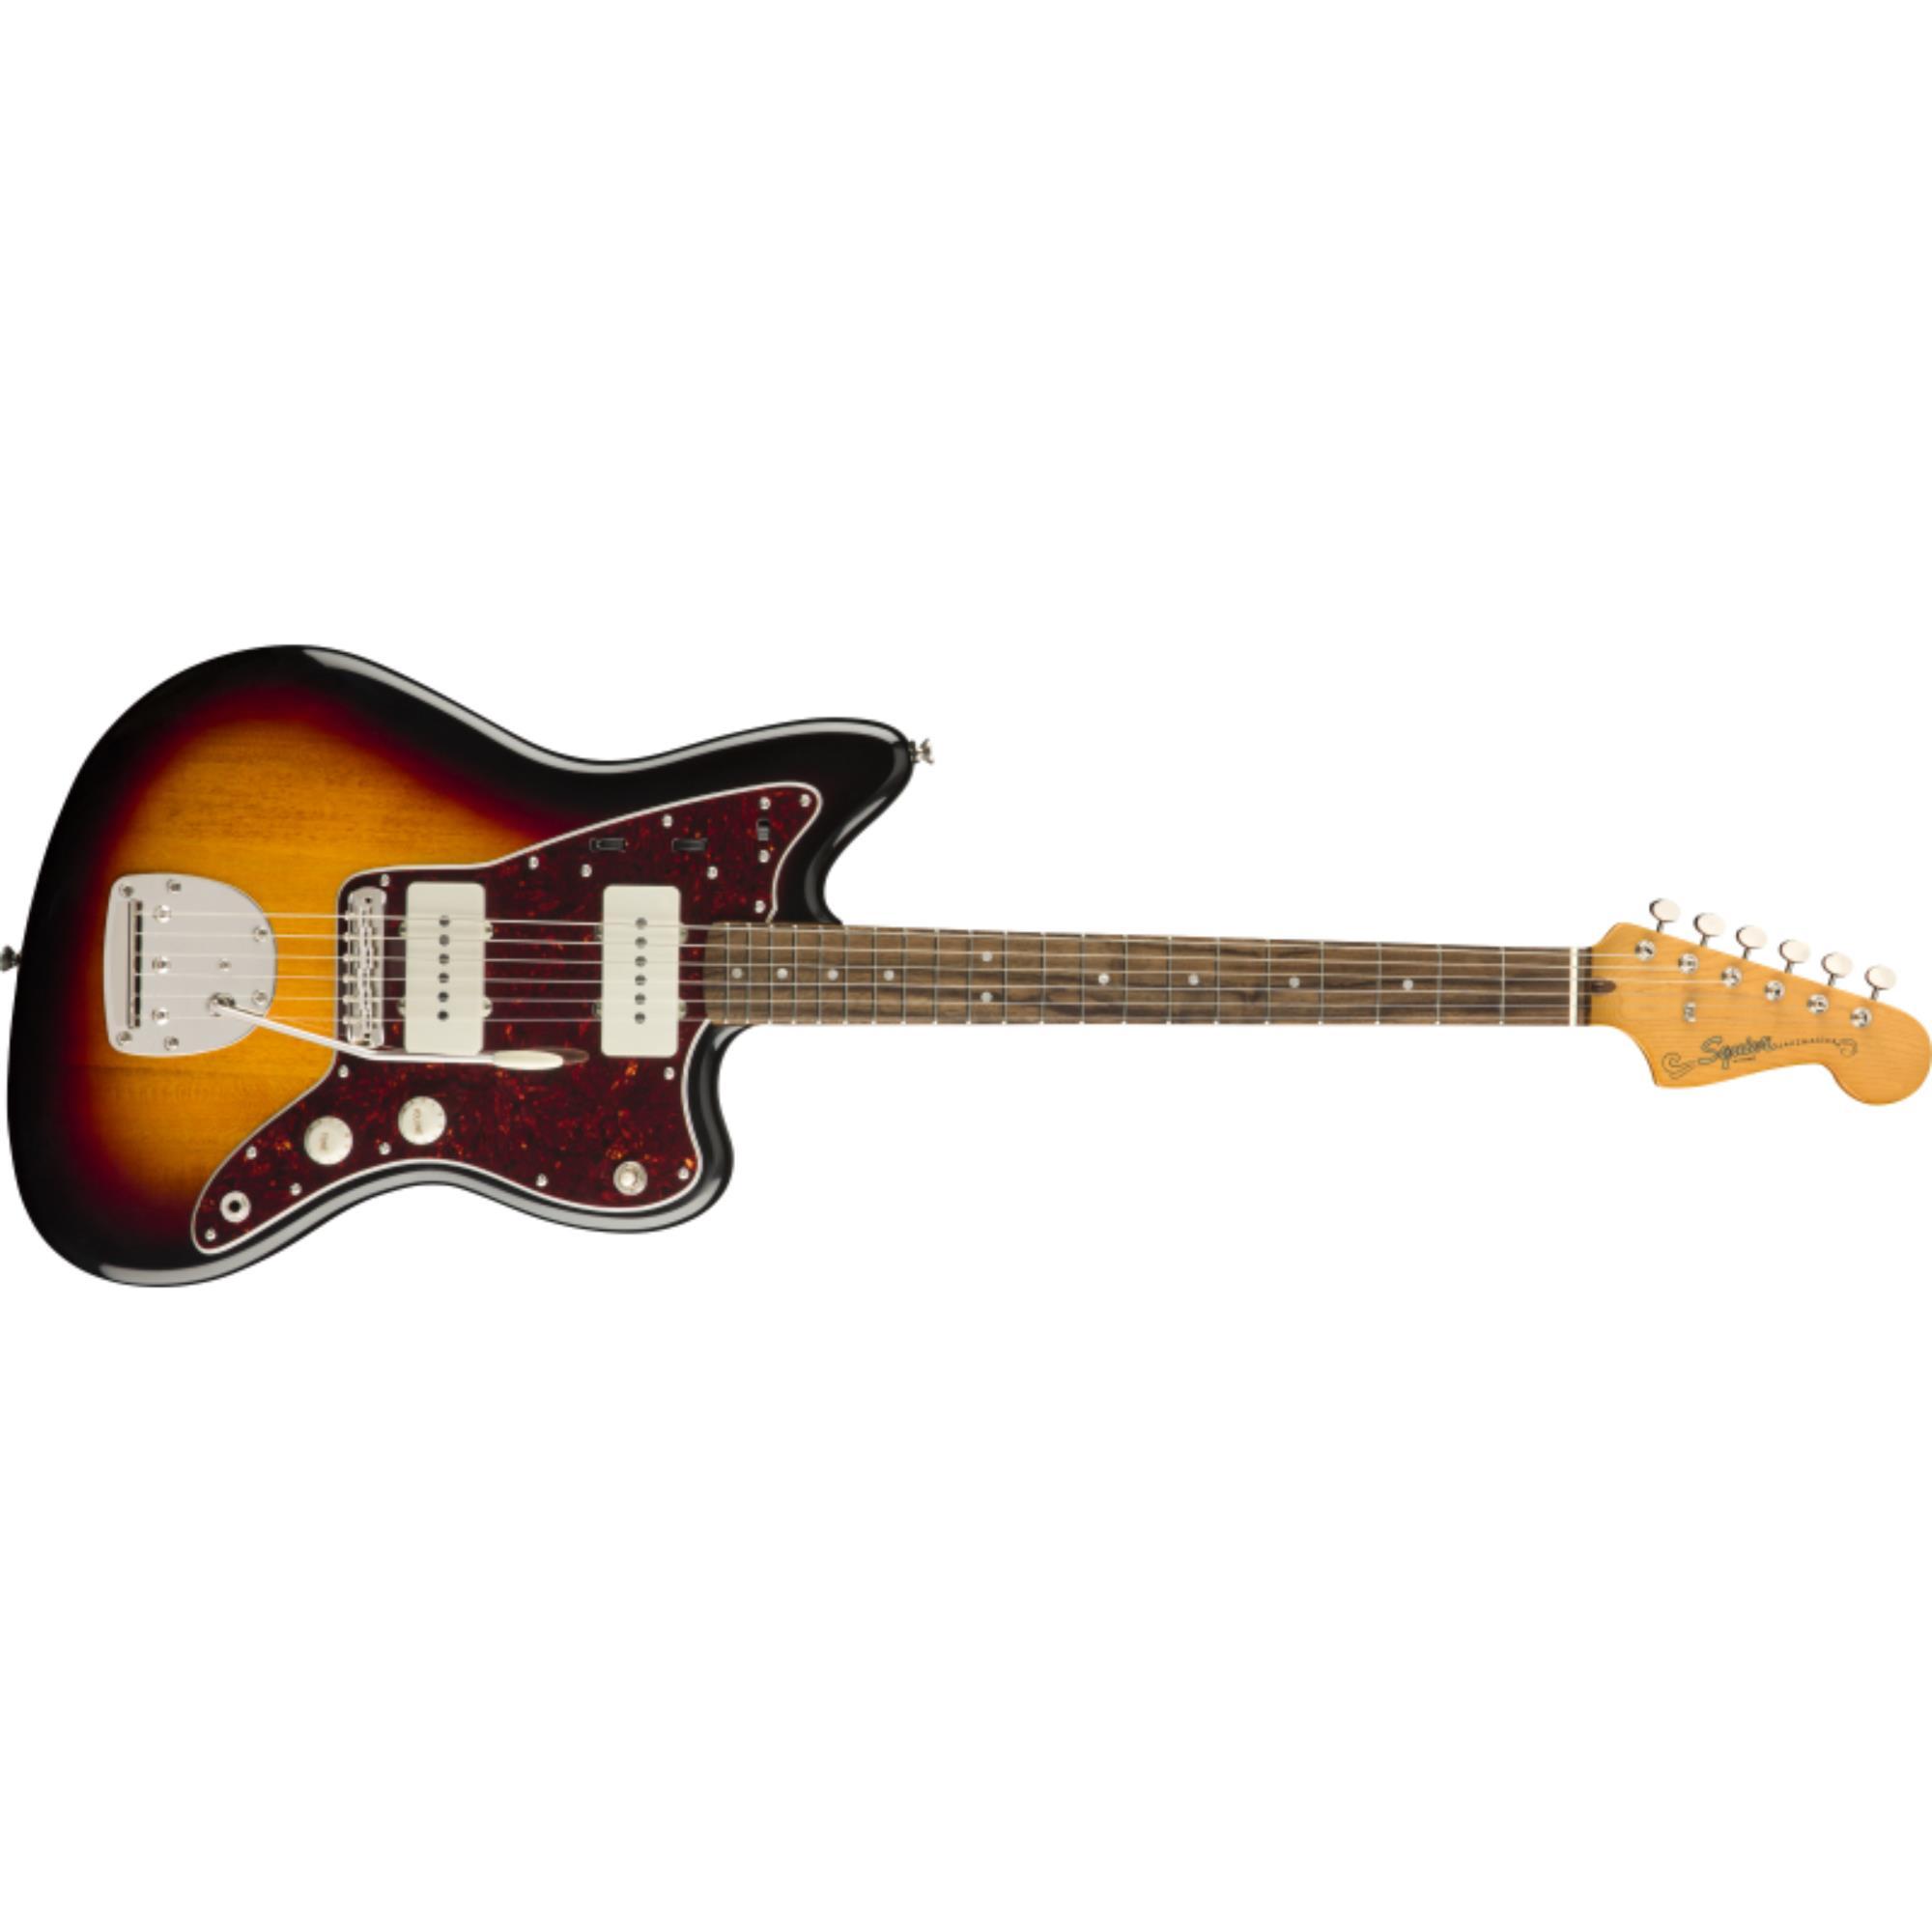 SQUIER-Classic-Vibe-60s-Jazzmaster-LF-3-Color-Sunburst-0374083500-sku-24536